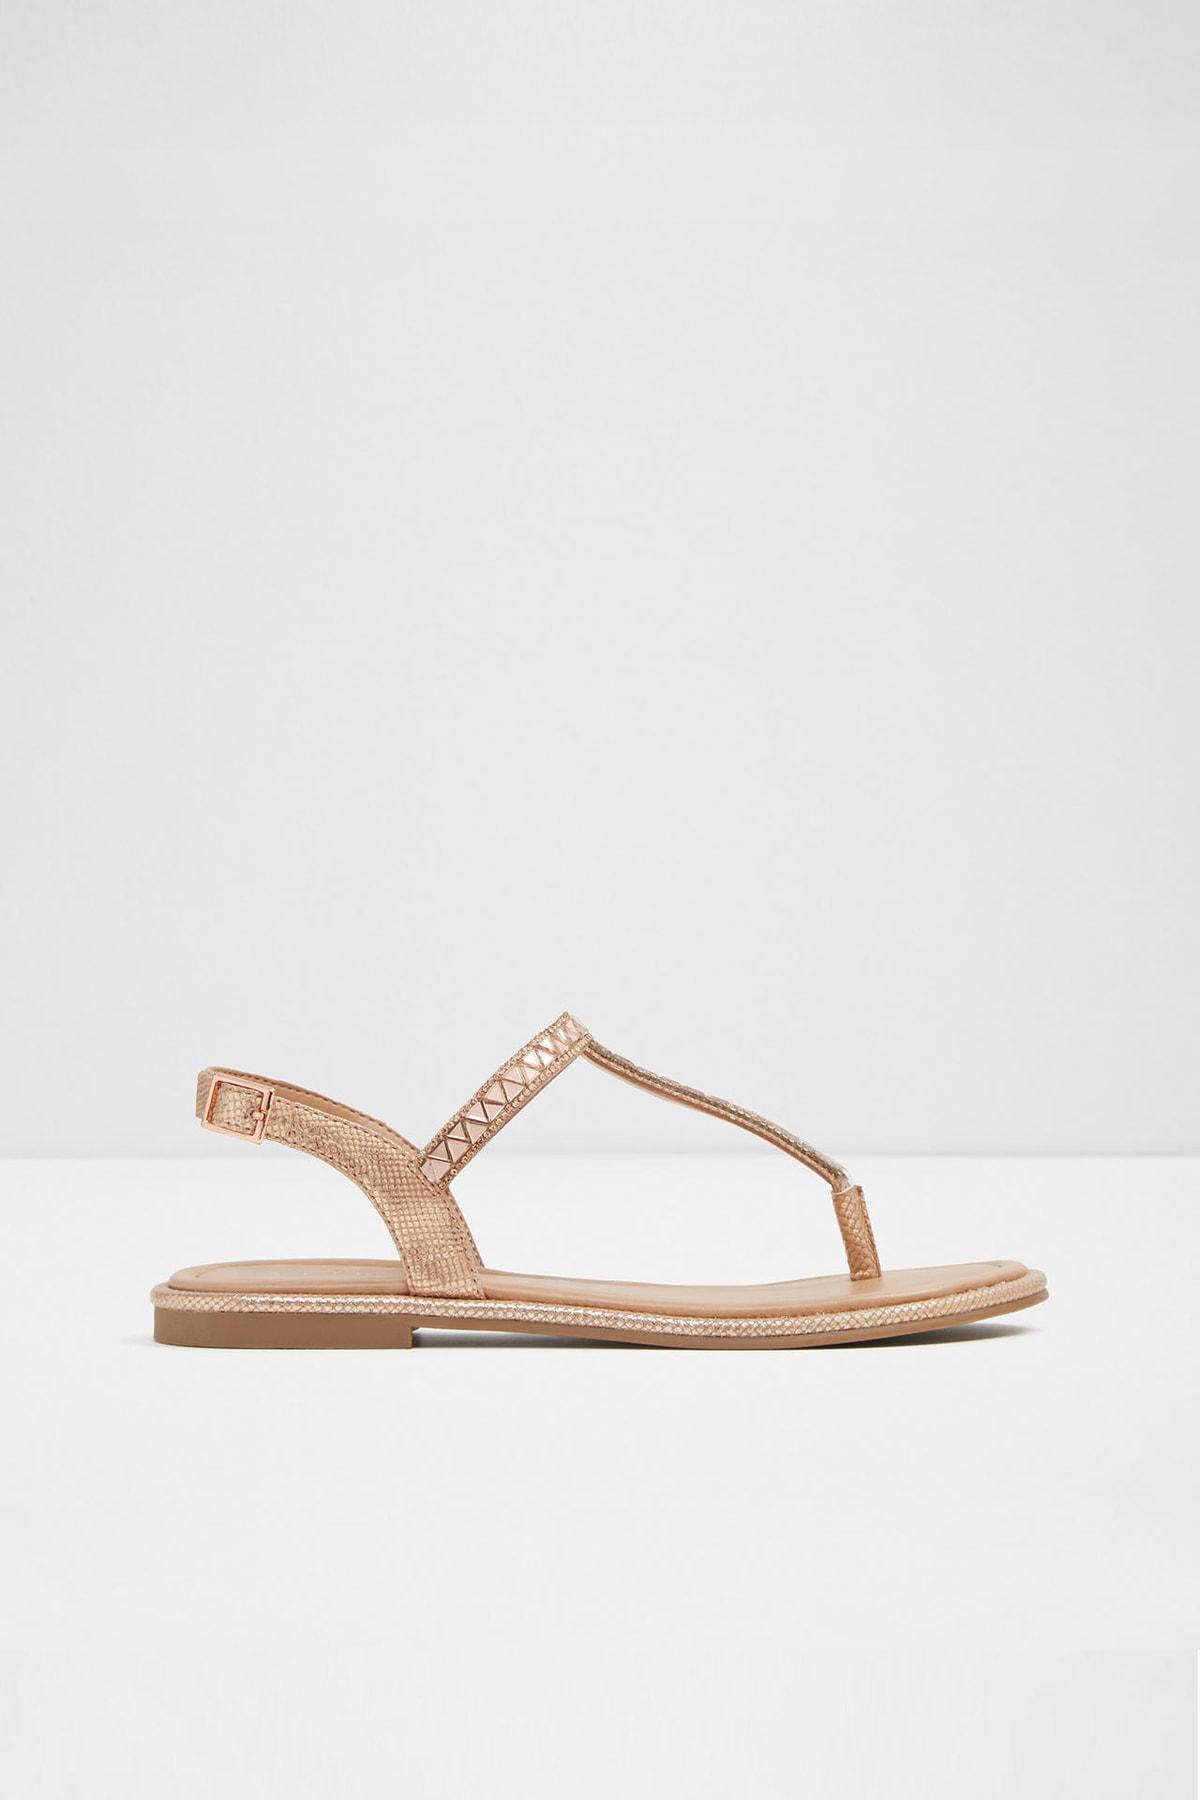 Aldo Sheeny - Pembe Kadın Sandalet 2